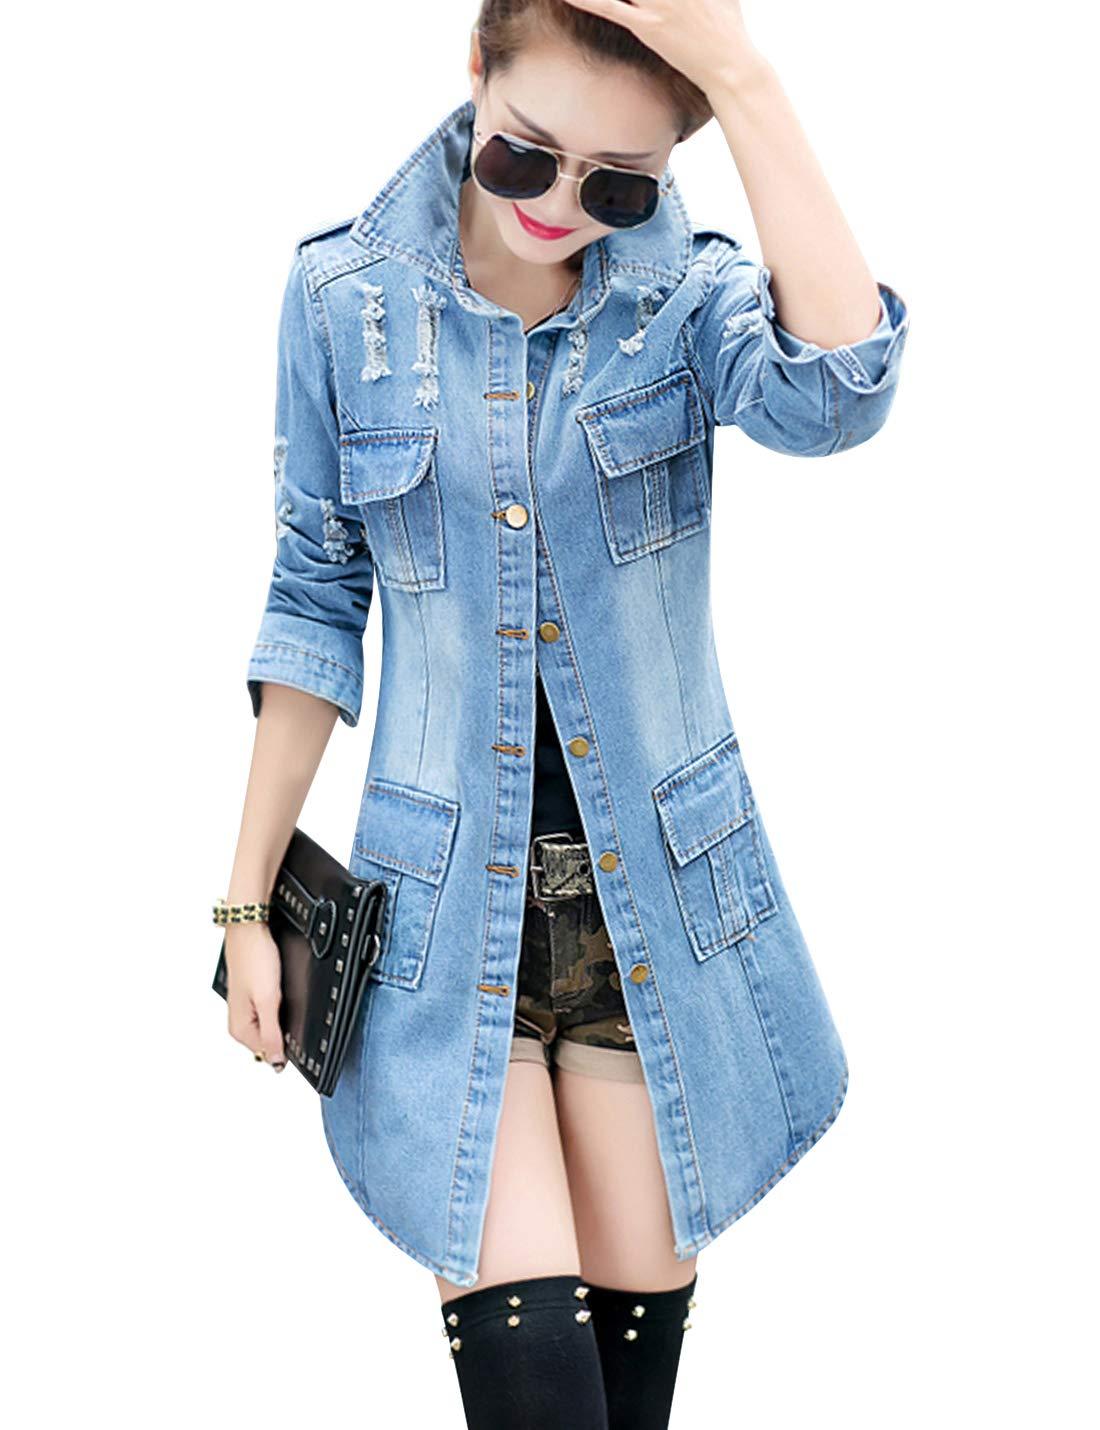 Tanming Women's Casual Lapel Slim Long Sleeve Denim Outercoat Jacket Windbreaker Tanming-100374